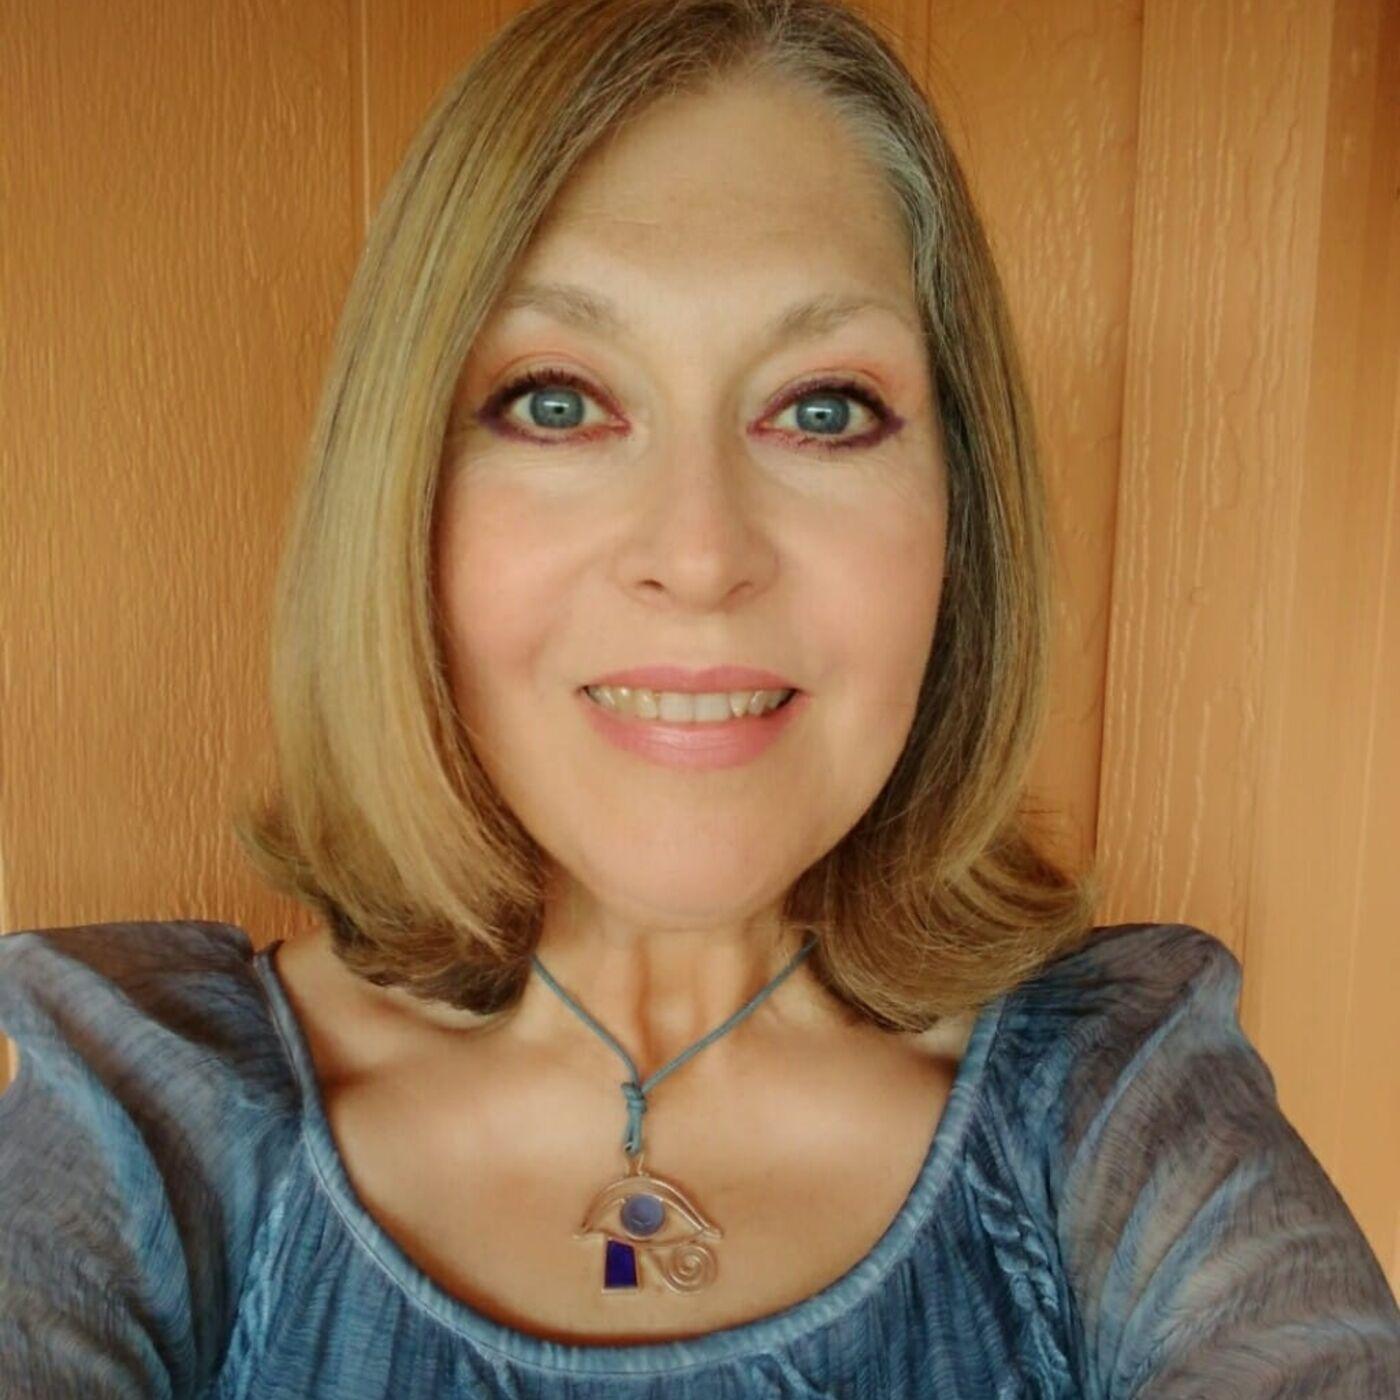 Enhancing the Purpose-Driven Life - Featuring Intuitive, Spiritual Facilitator and Crystal Therapist KO BAJA